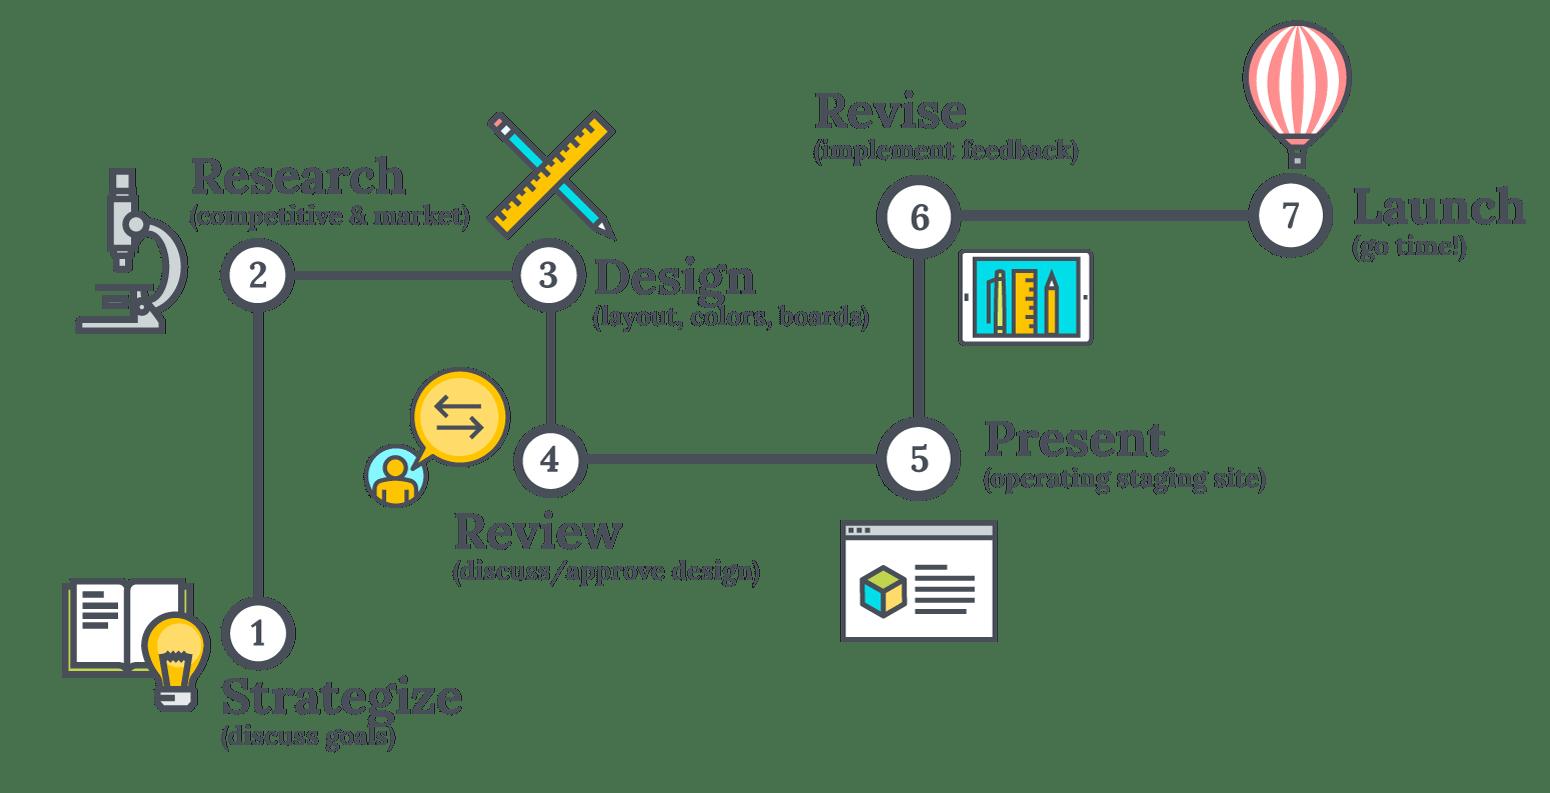 Dhalite Process Workflow